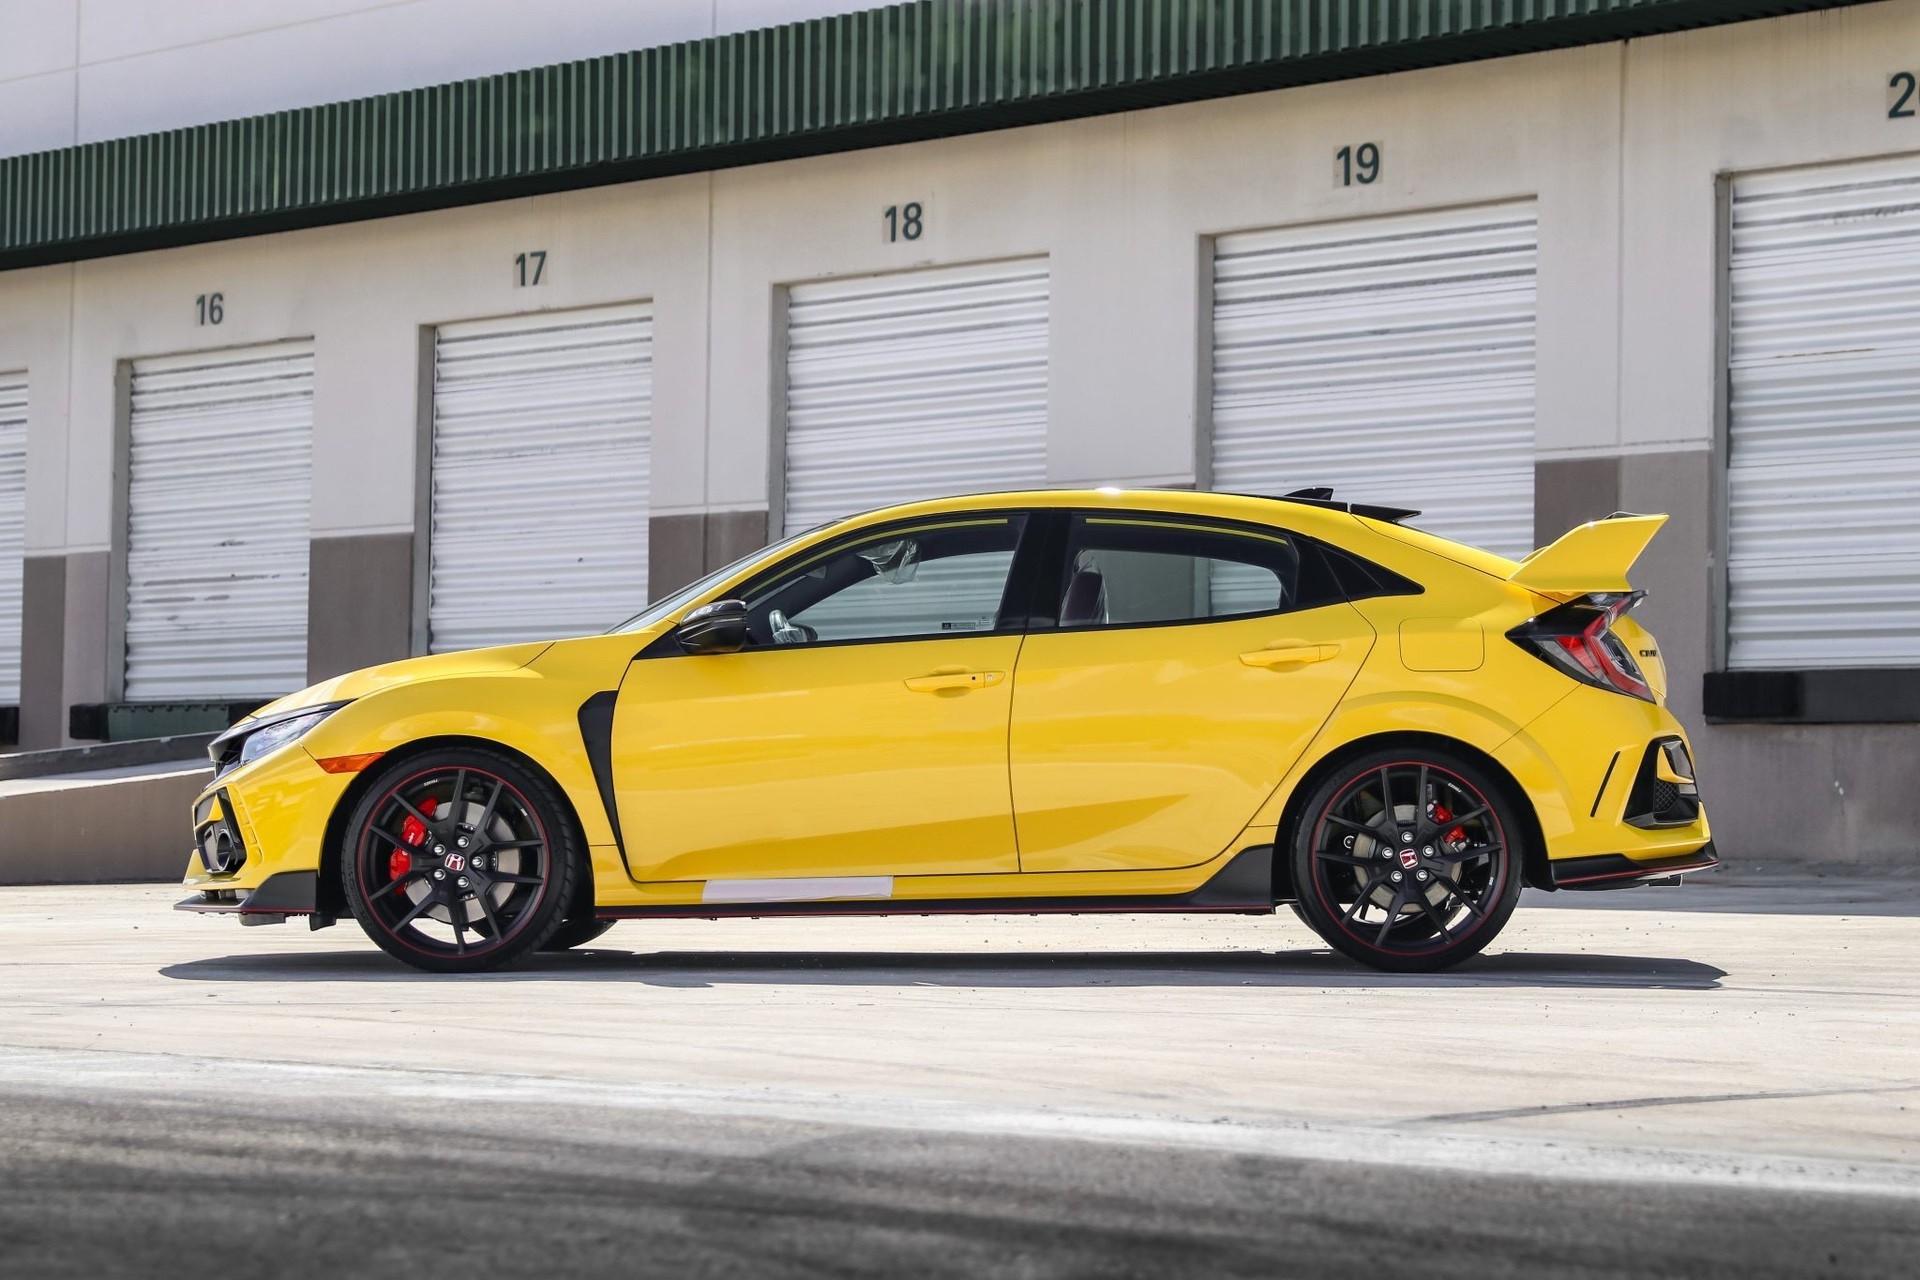 2021_Honda_Civic_Type_R_Limited_Edition-0001